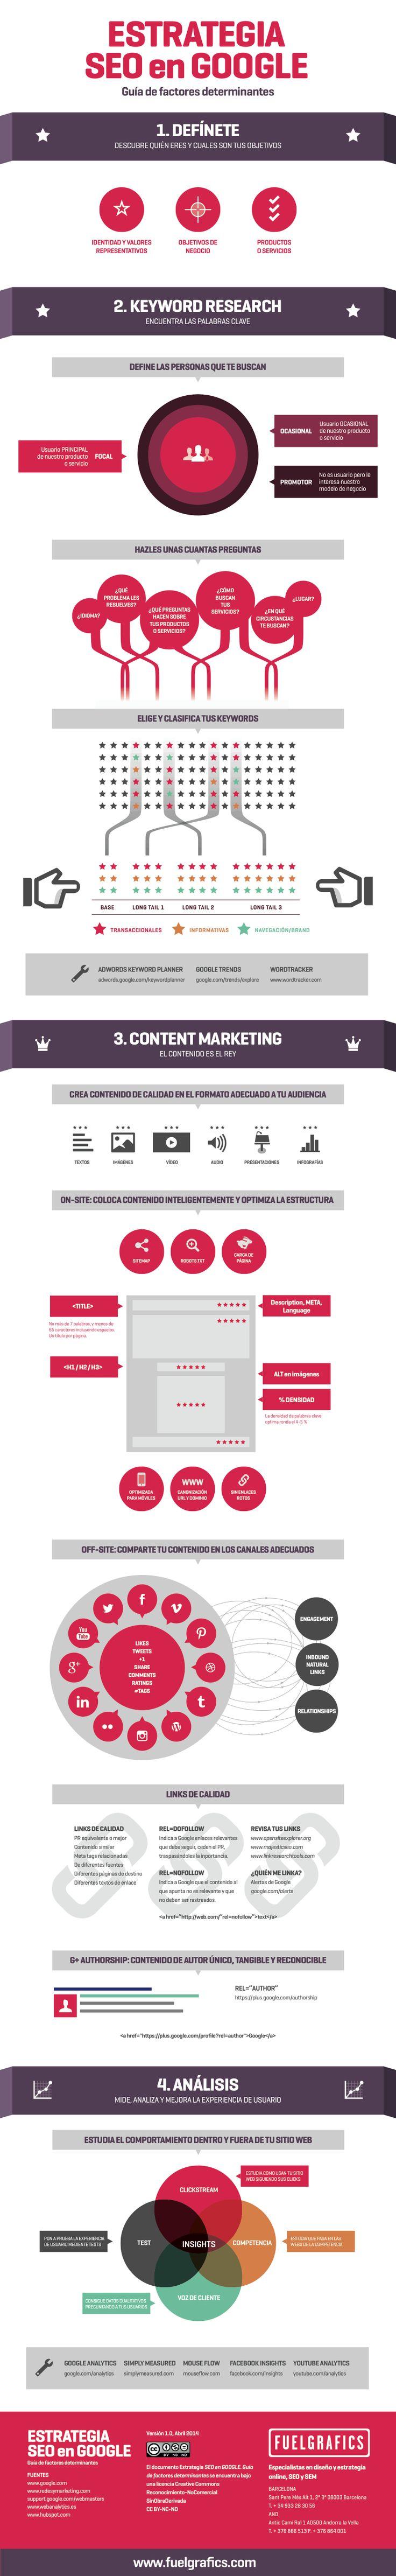 infografia_estrategia_seo_en_google.gif (800×5201)